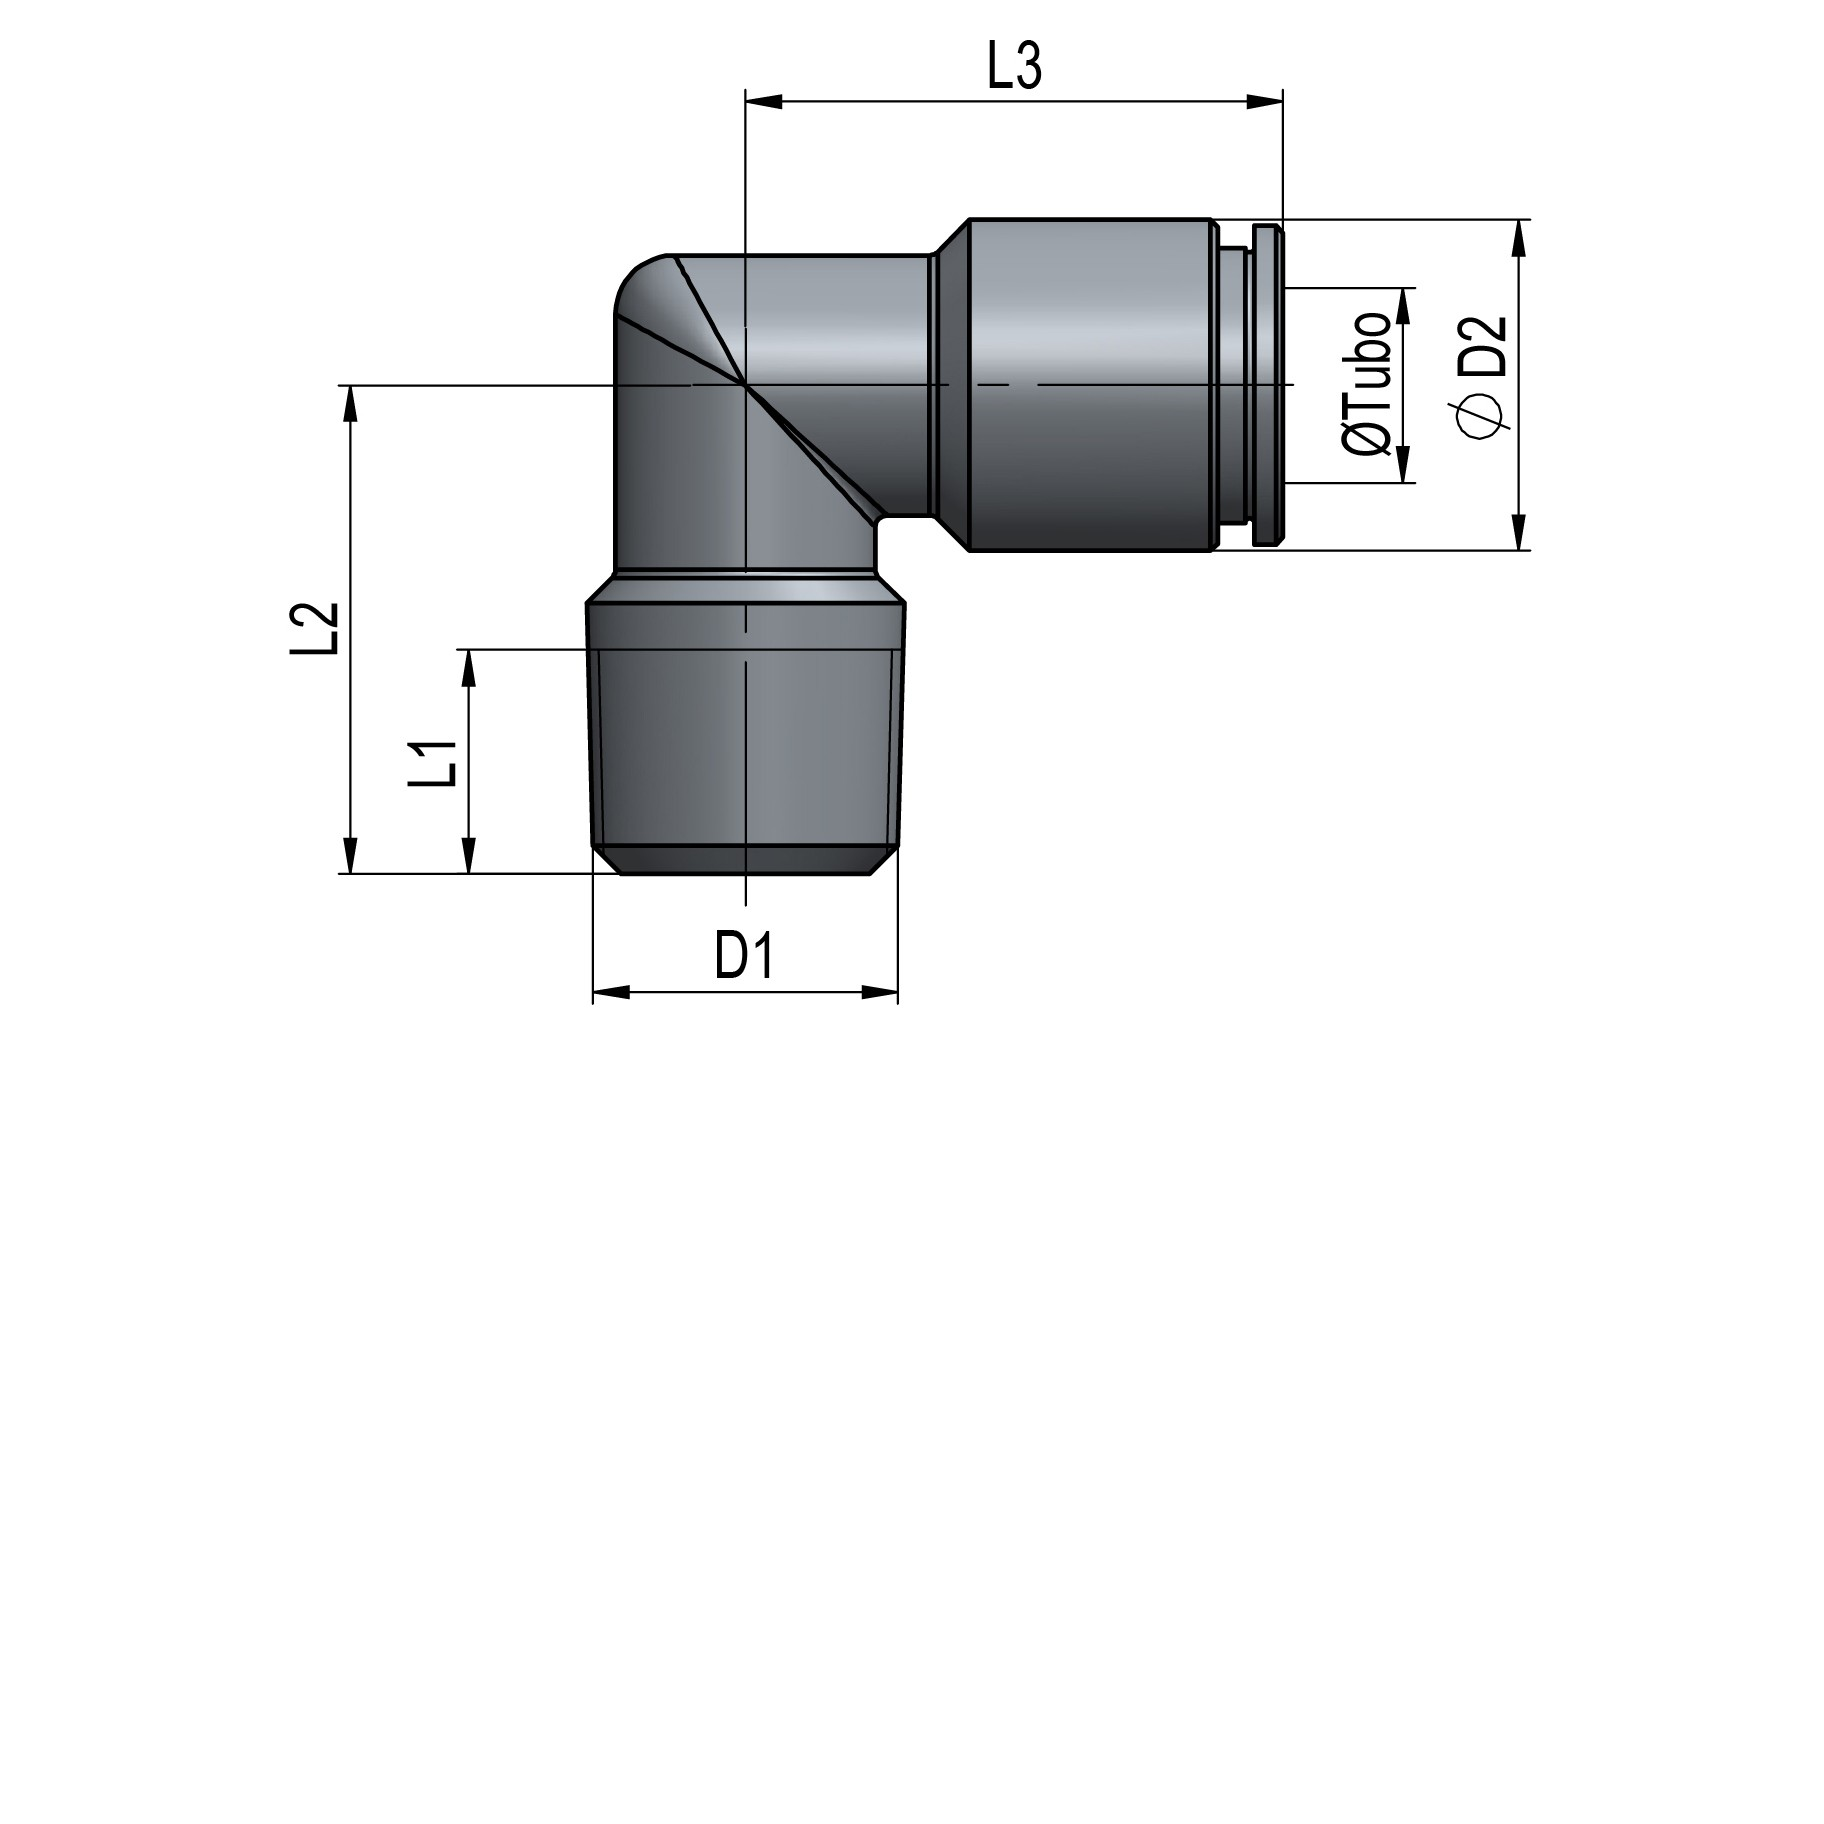 MX14 10 14